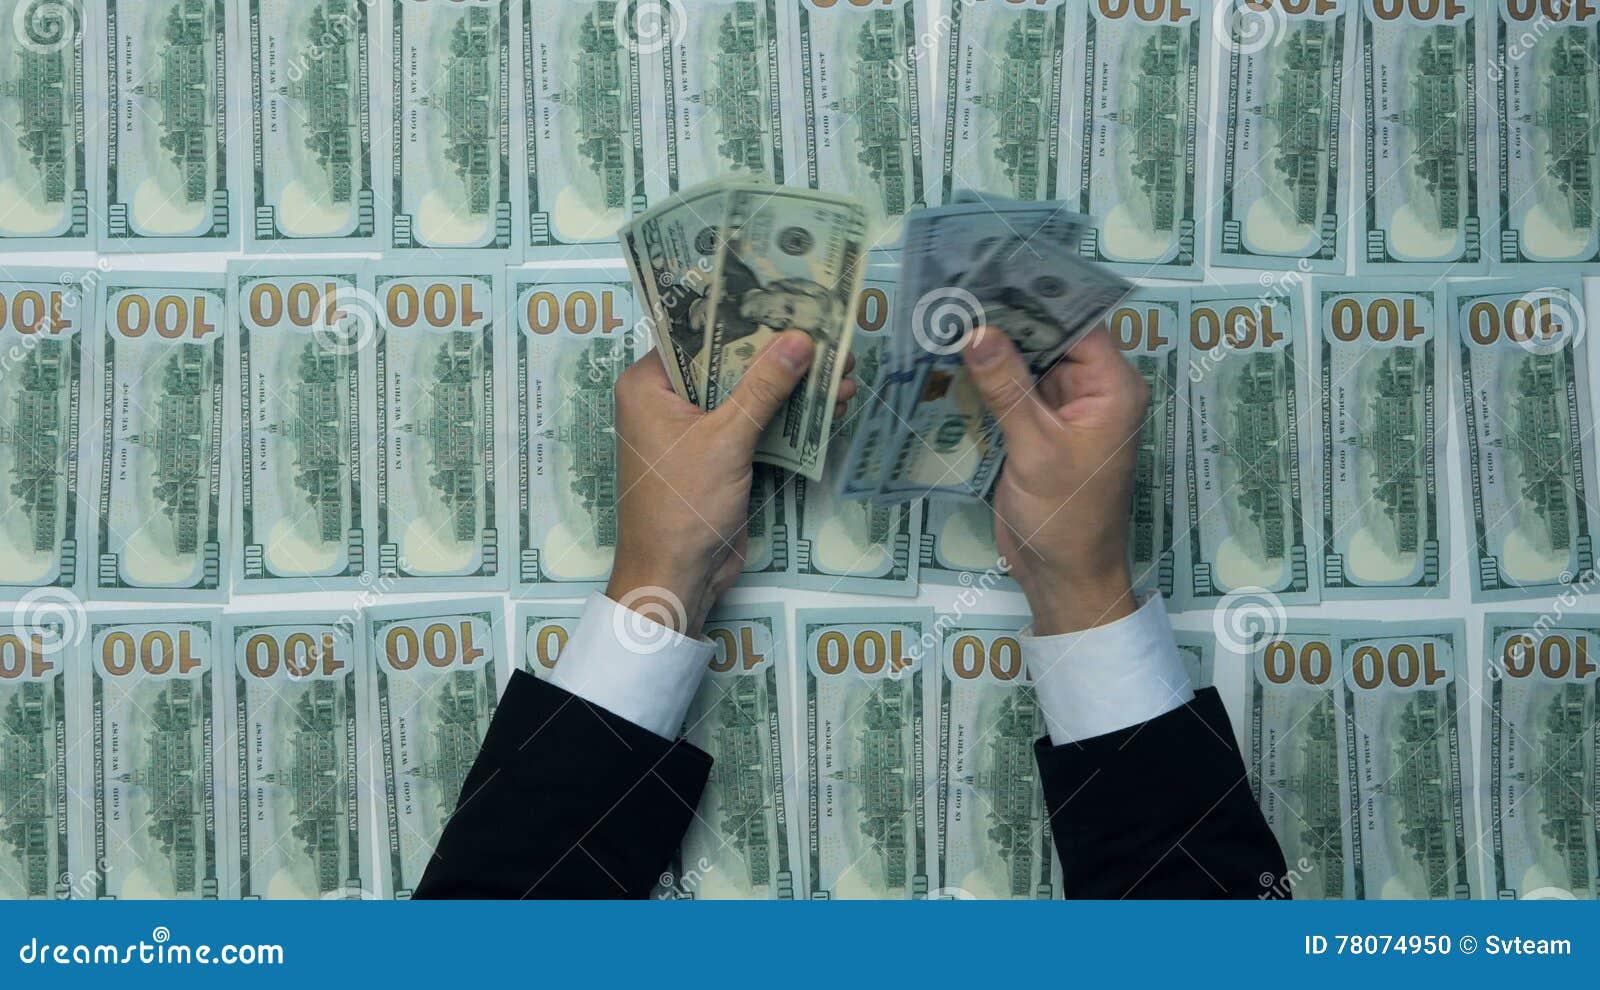 Loan money in lagos image 4